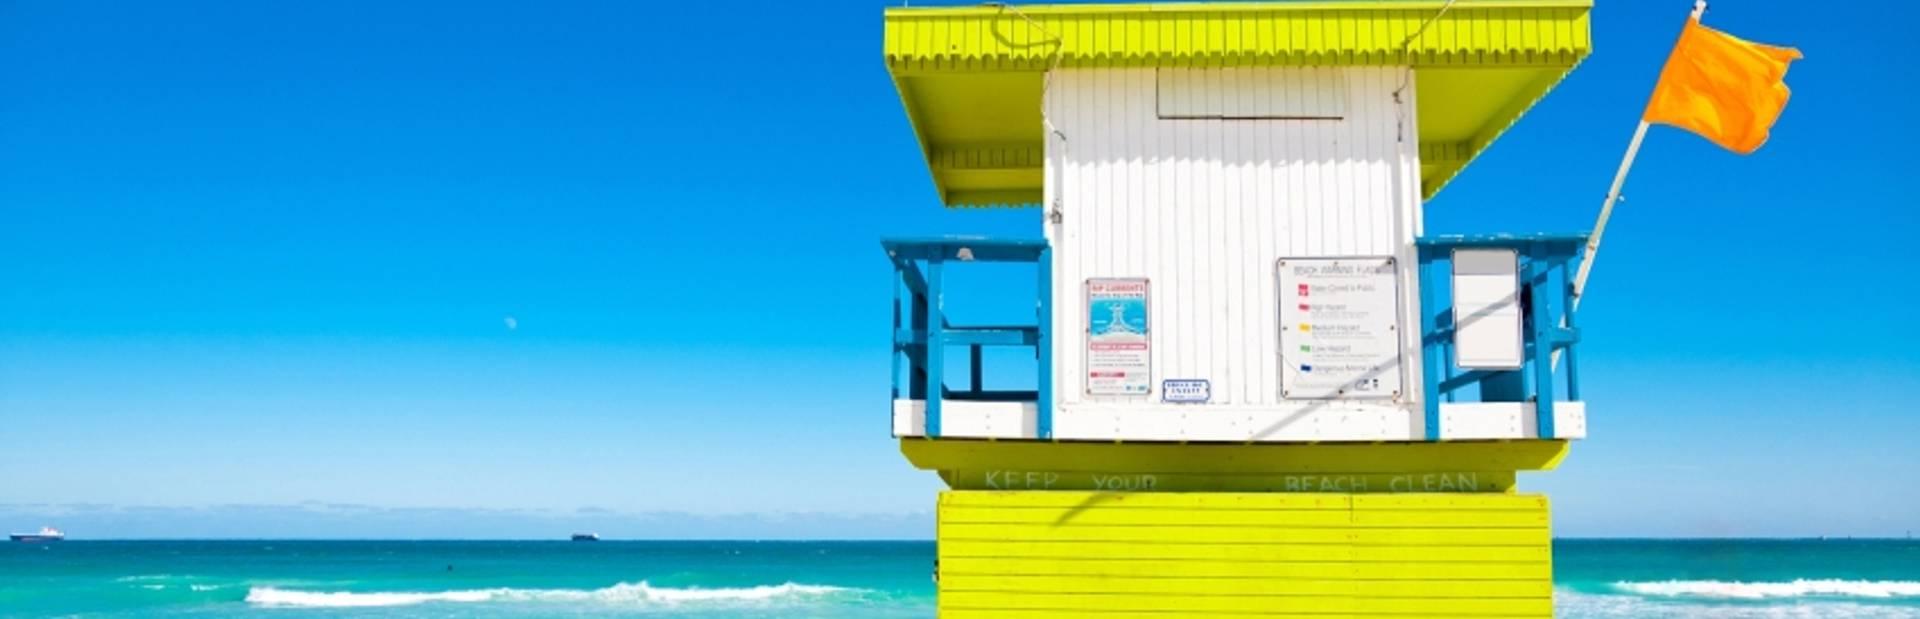 Have an Underwater Adventure in Florida